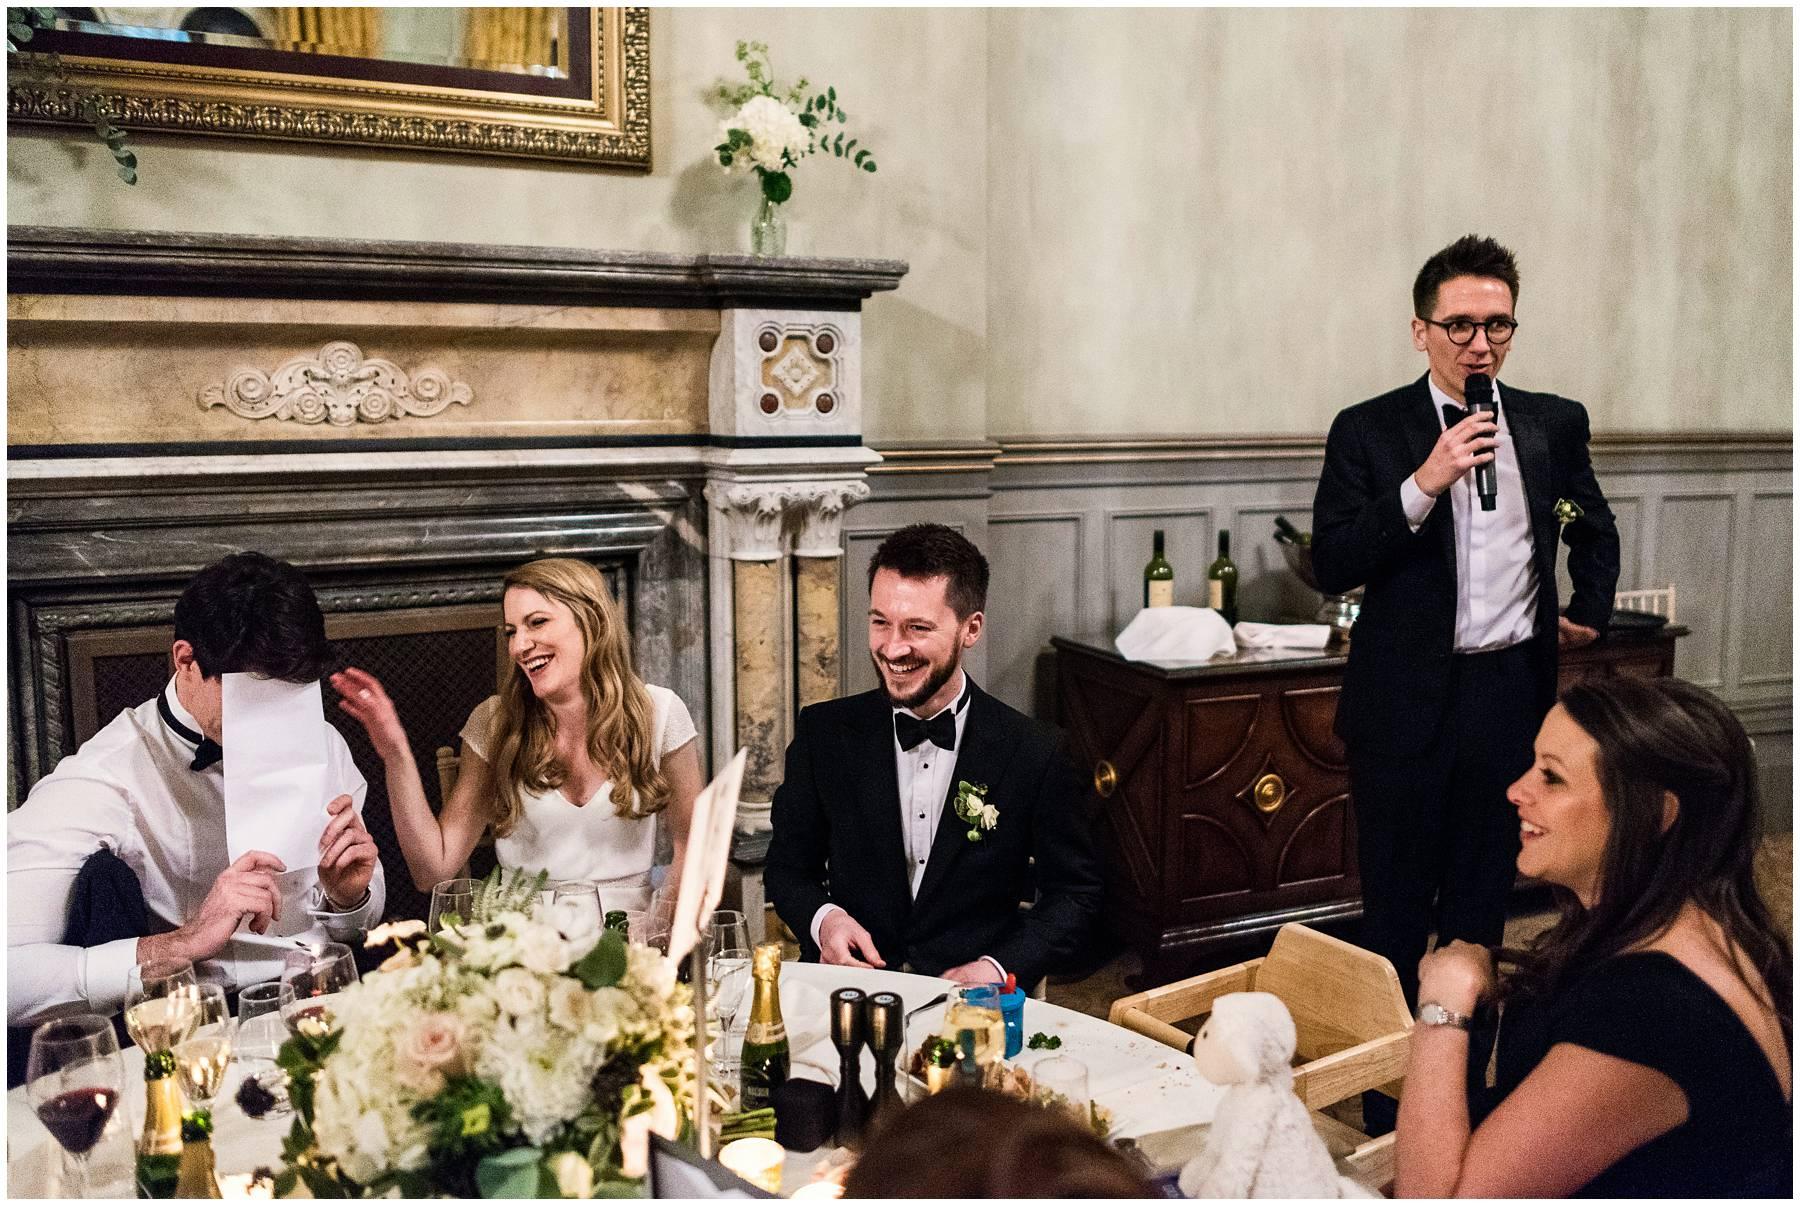 Winter Wedding at St Pancras Renaissance Hotel